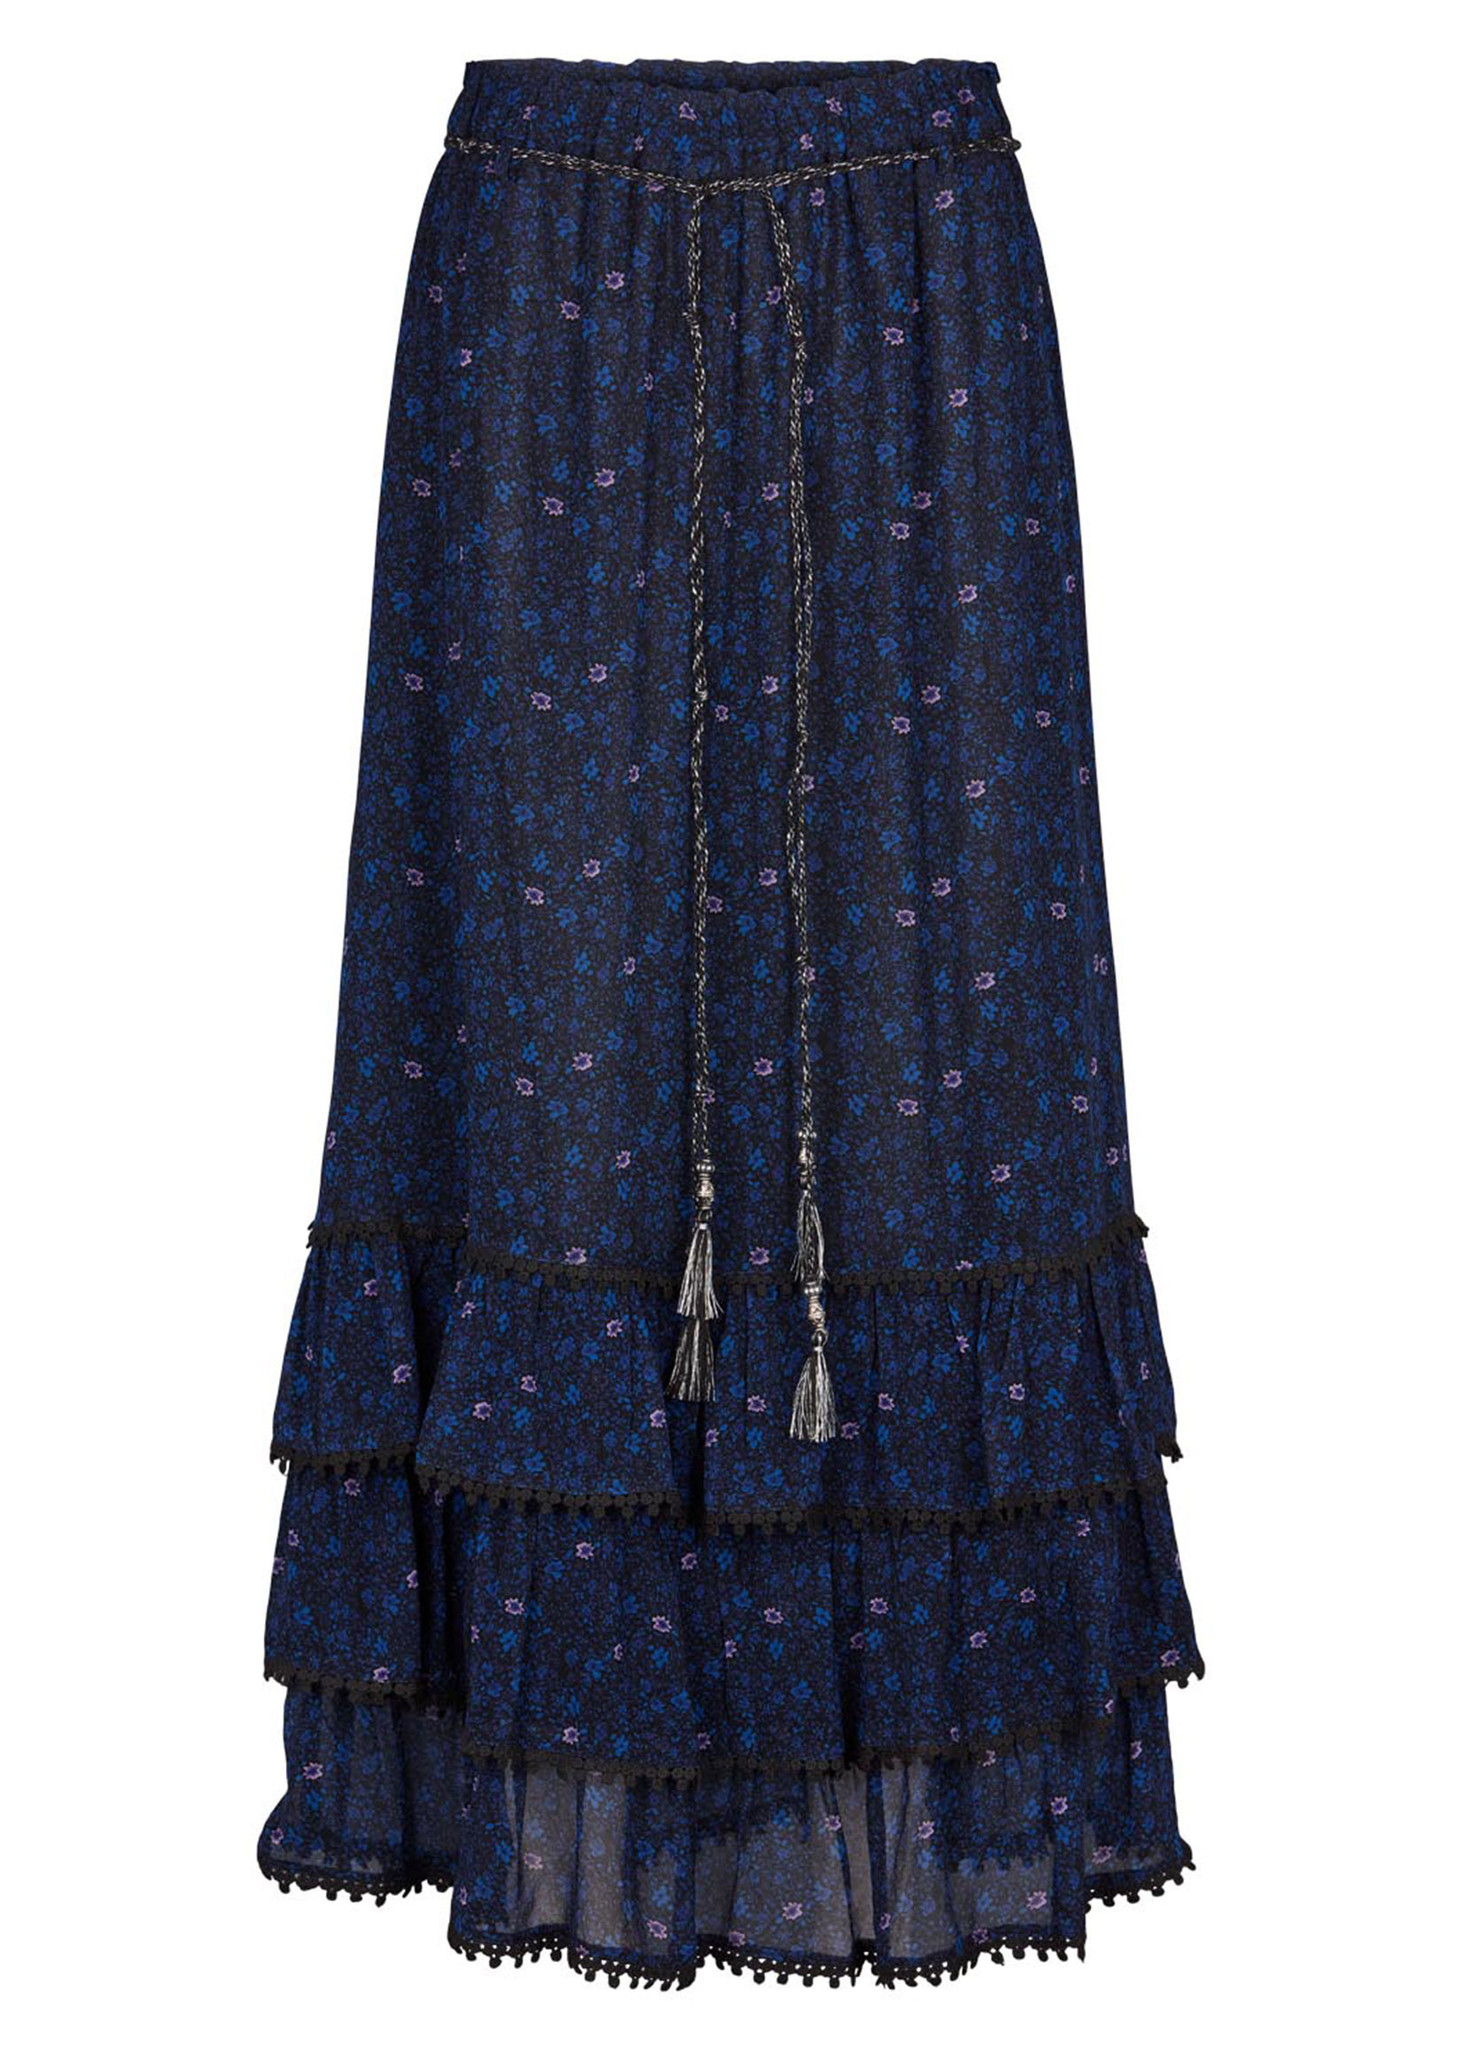 Amara Skirt Mazarine Blue-1